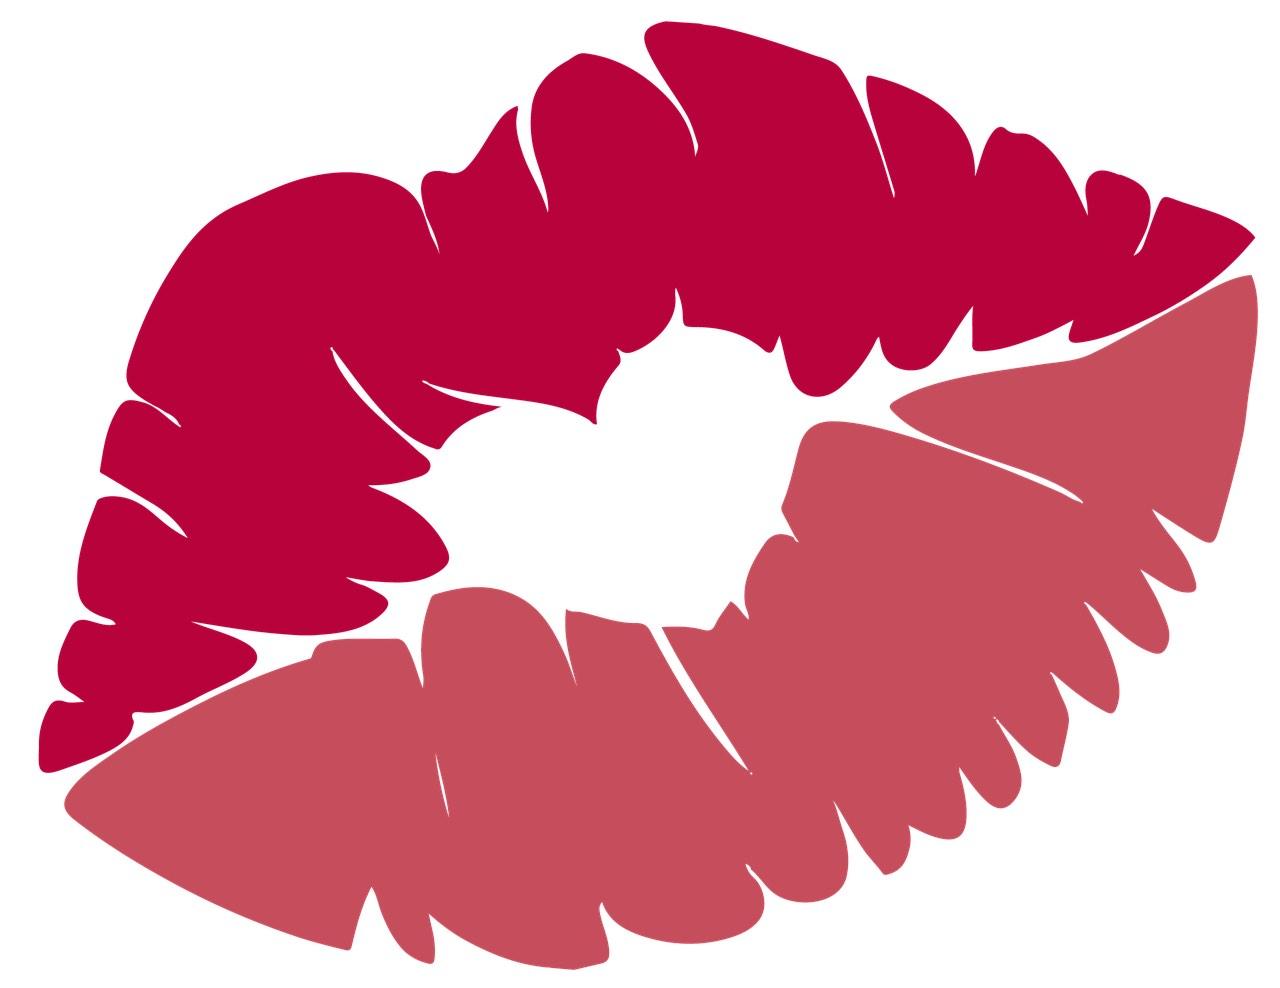 Lippenstift, Lippenfarbe, rote Lippen, roter Lippenstift, Schminktipps, Schminktante, Anja Frankenhäuser